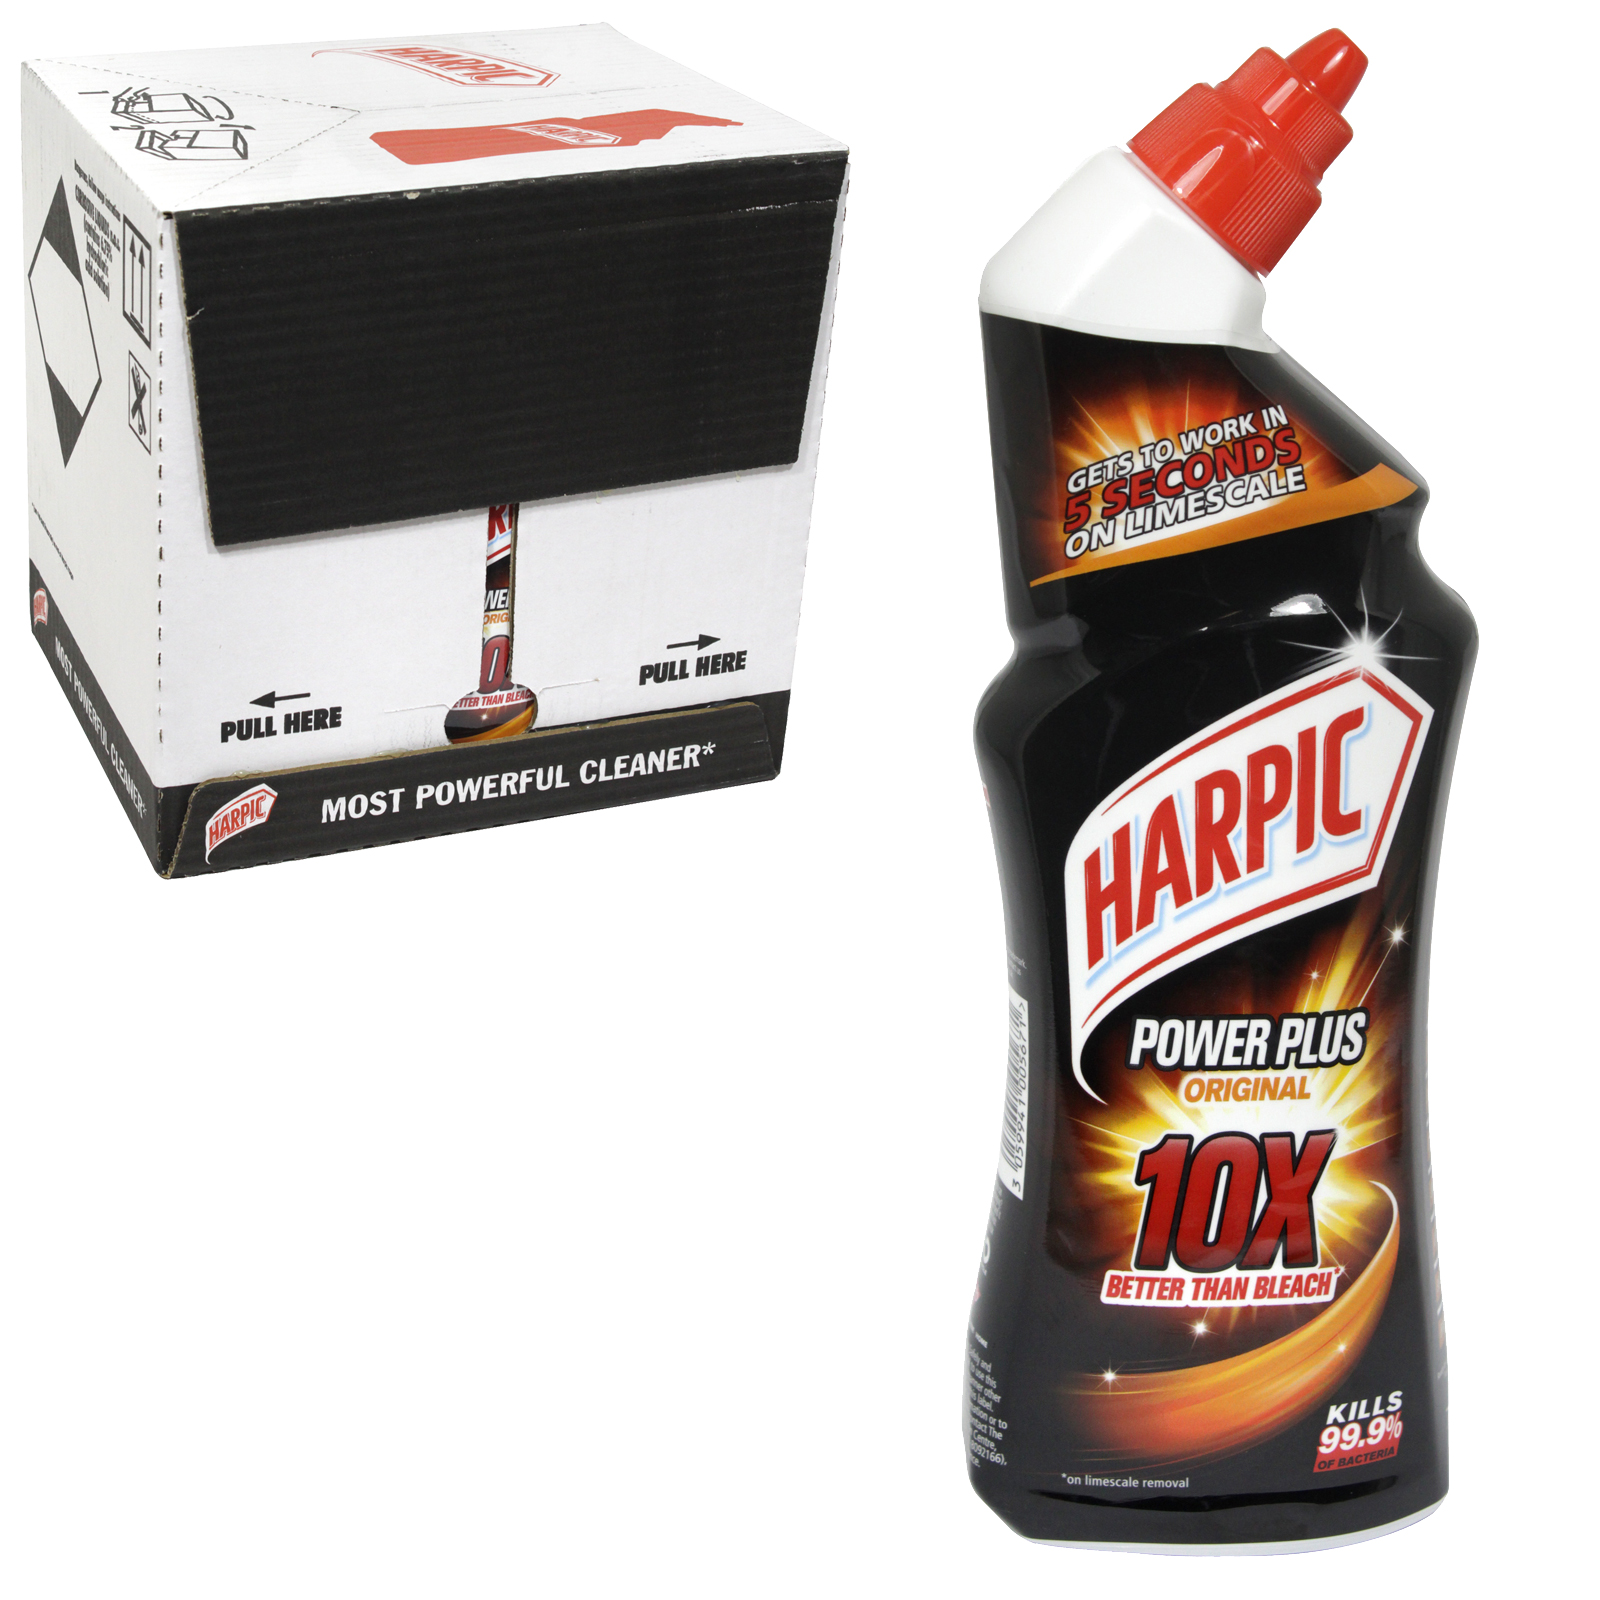 HARPIC POWER PLUS MAX 10 750ML PM ?1.69  X6